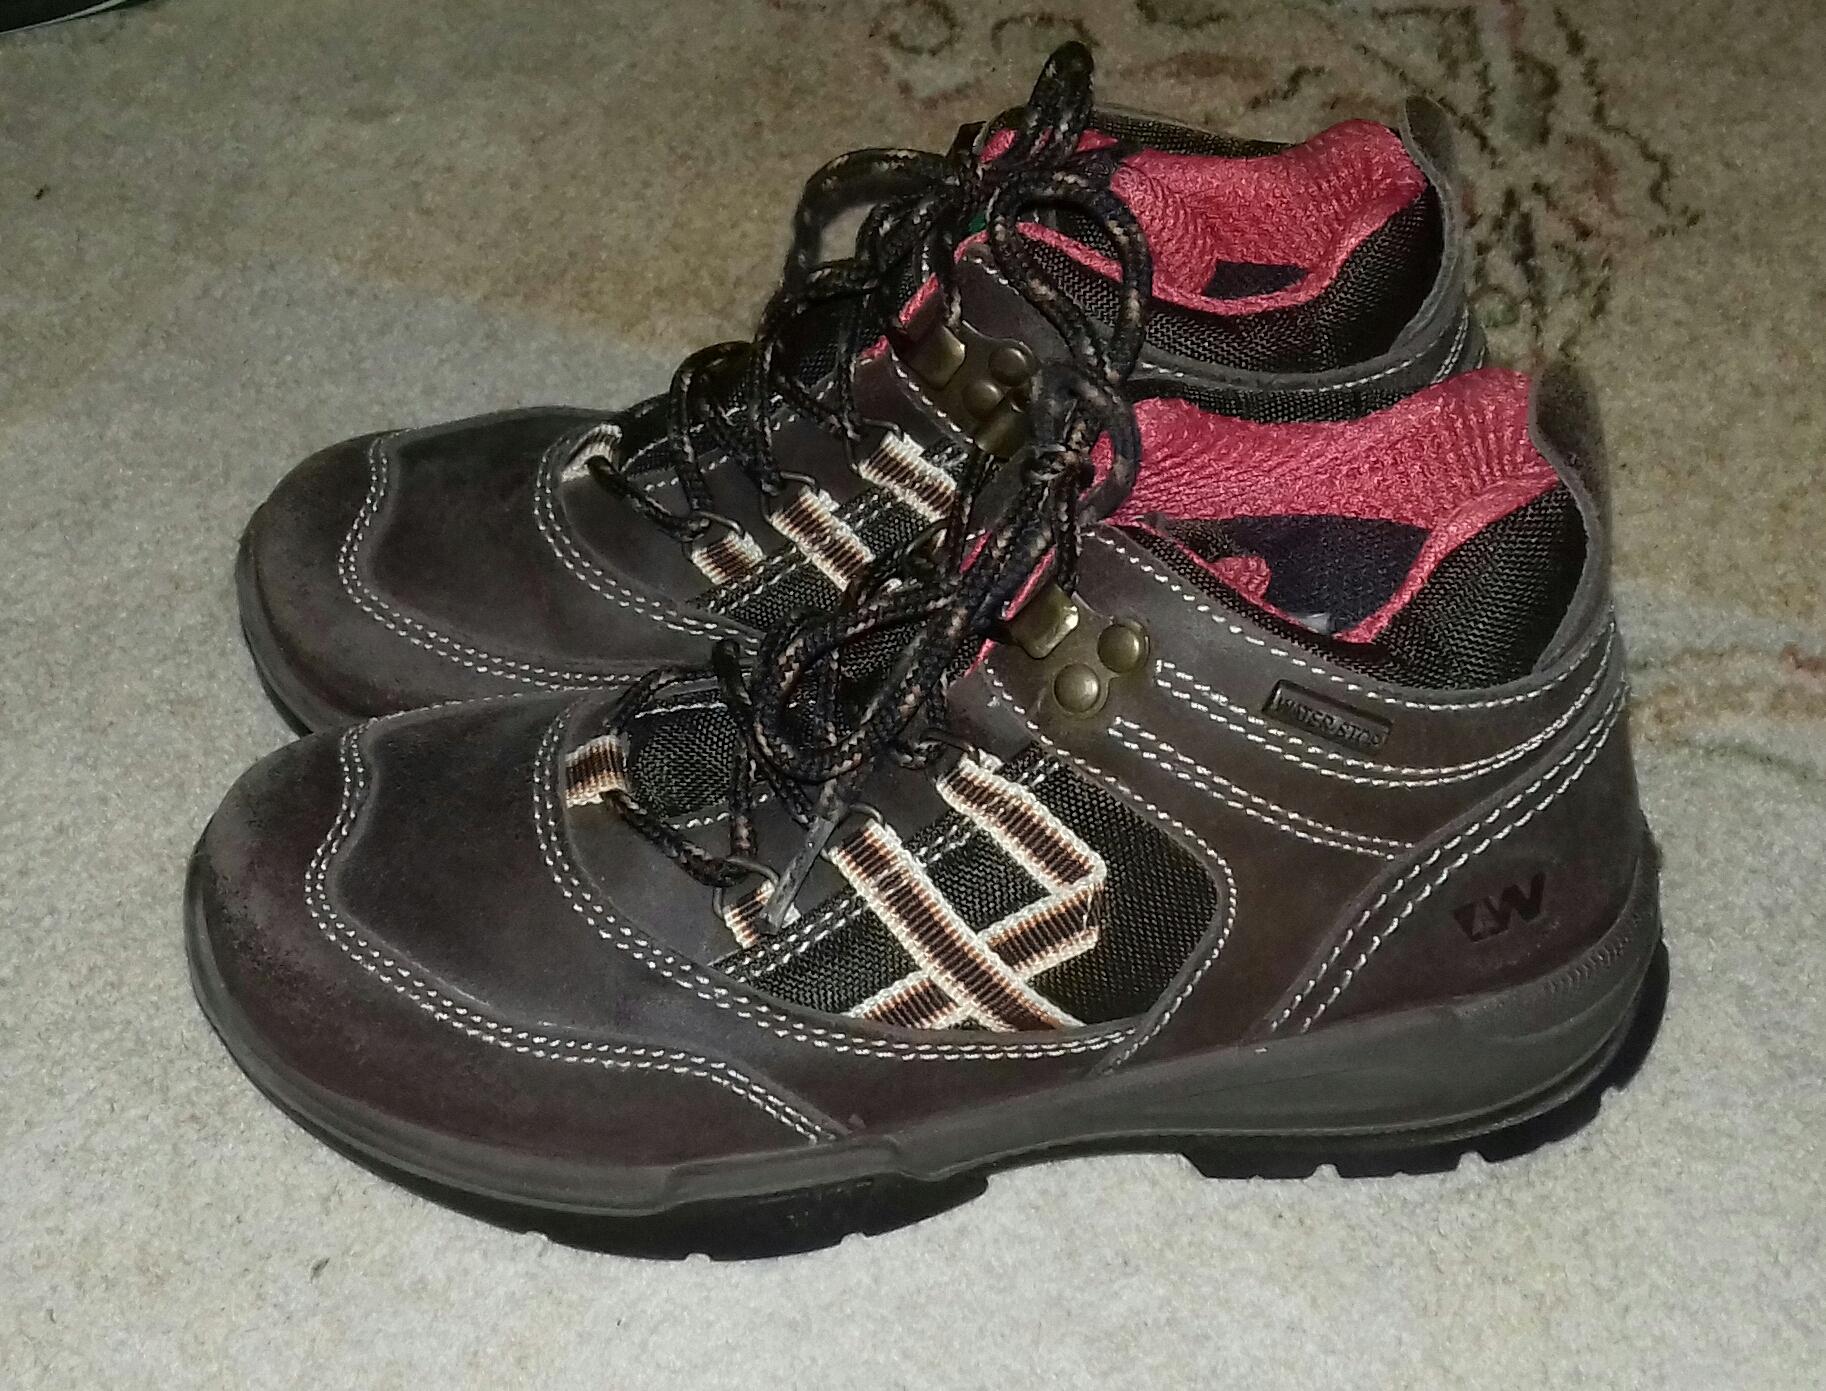 4f967a56 35 Weinbrenner buty trekkingowe wodoodporne membra - 7647859964 ...